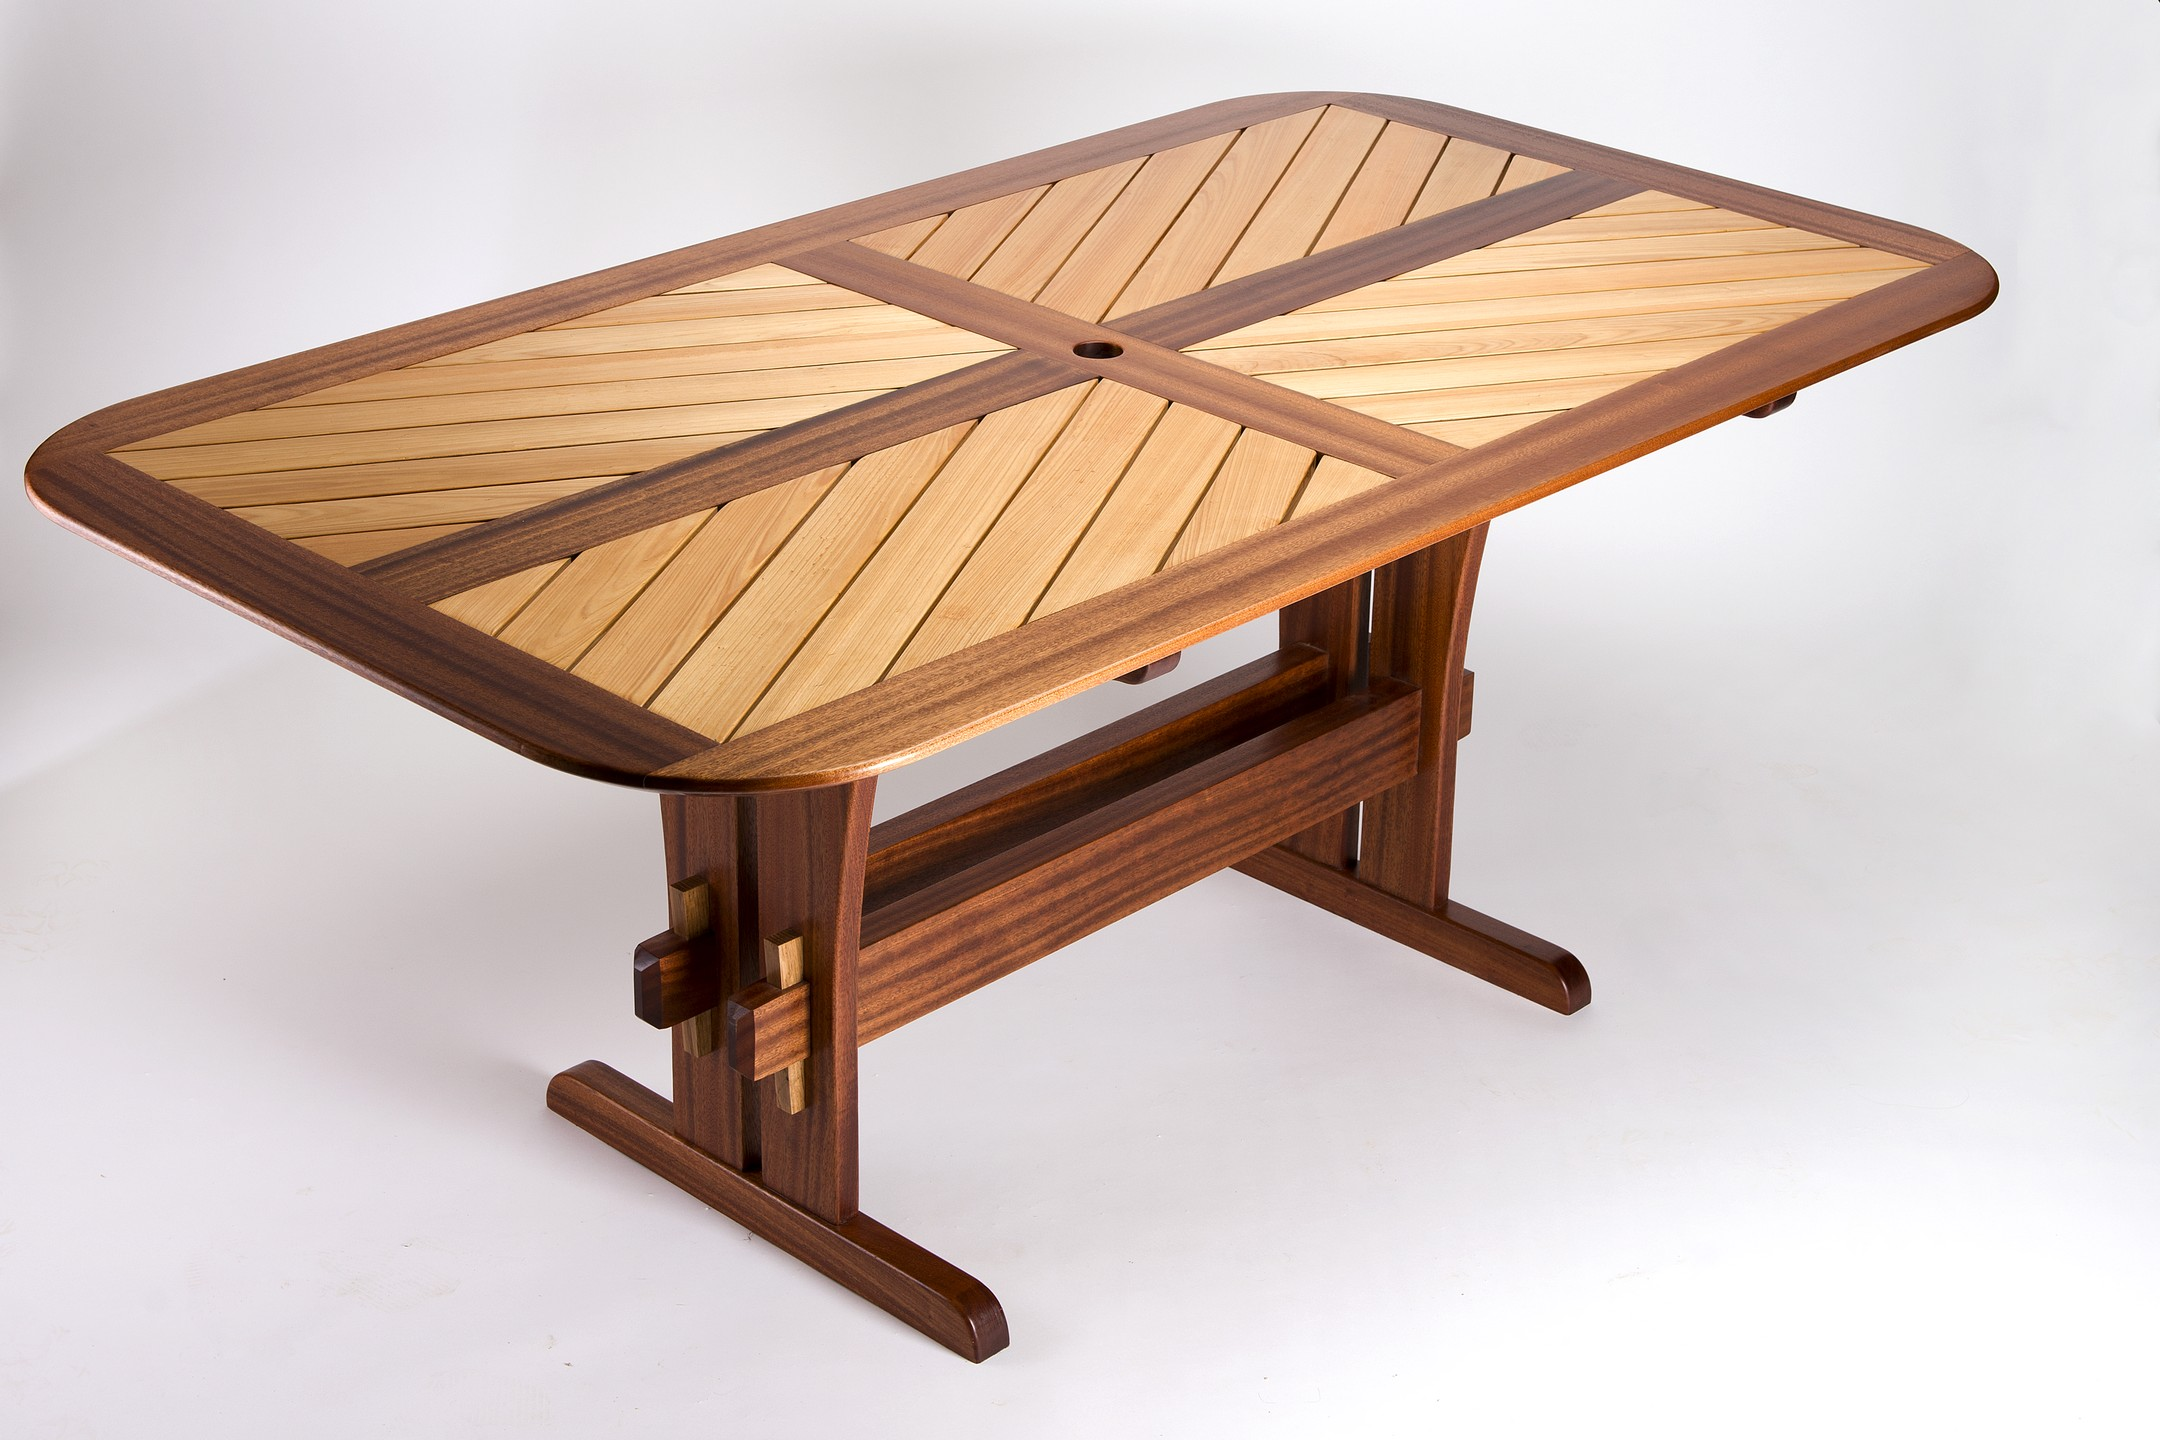 Furniture093.jpg